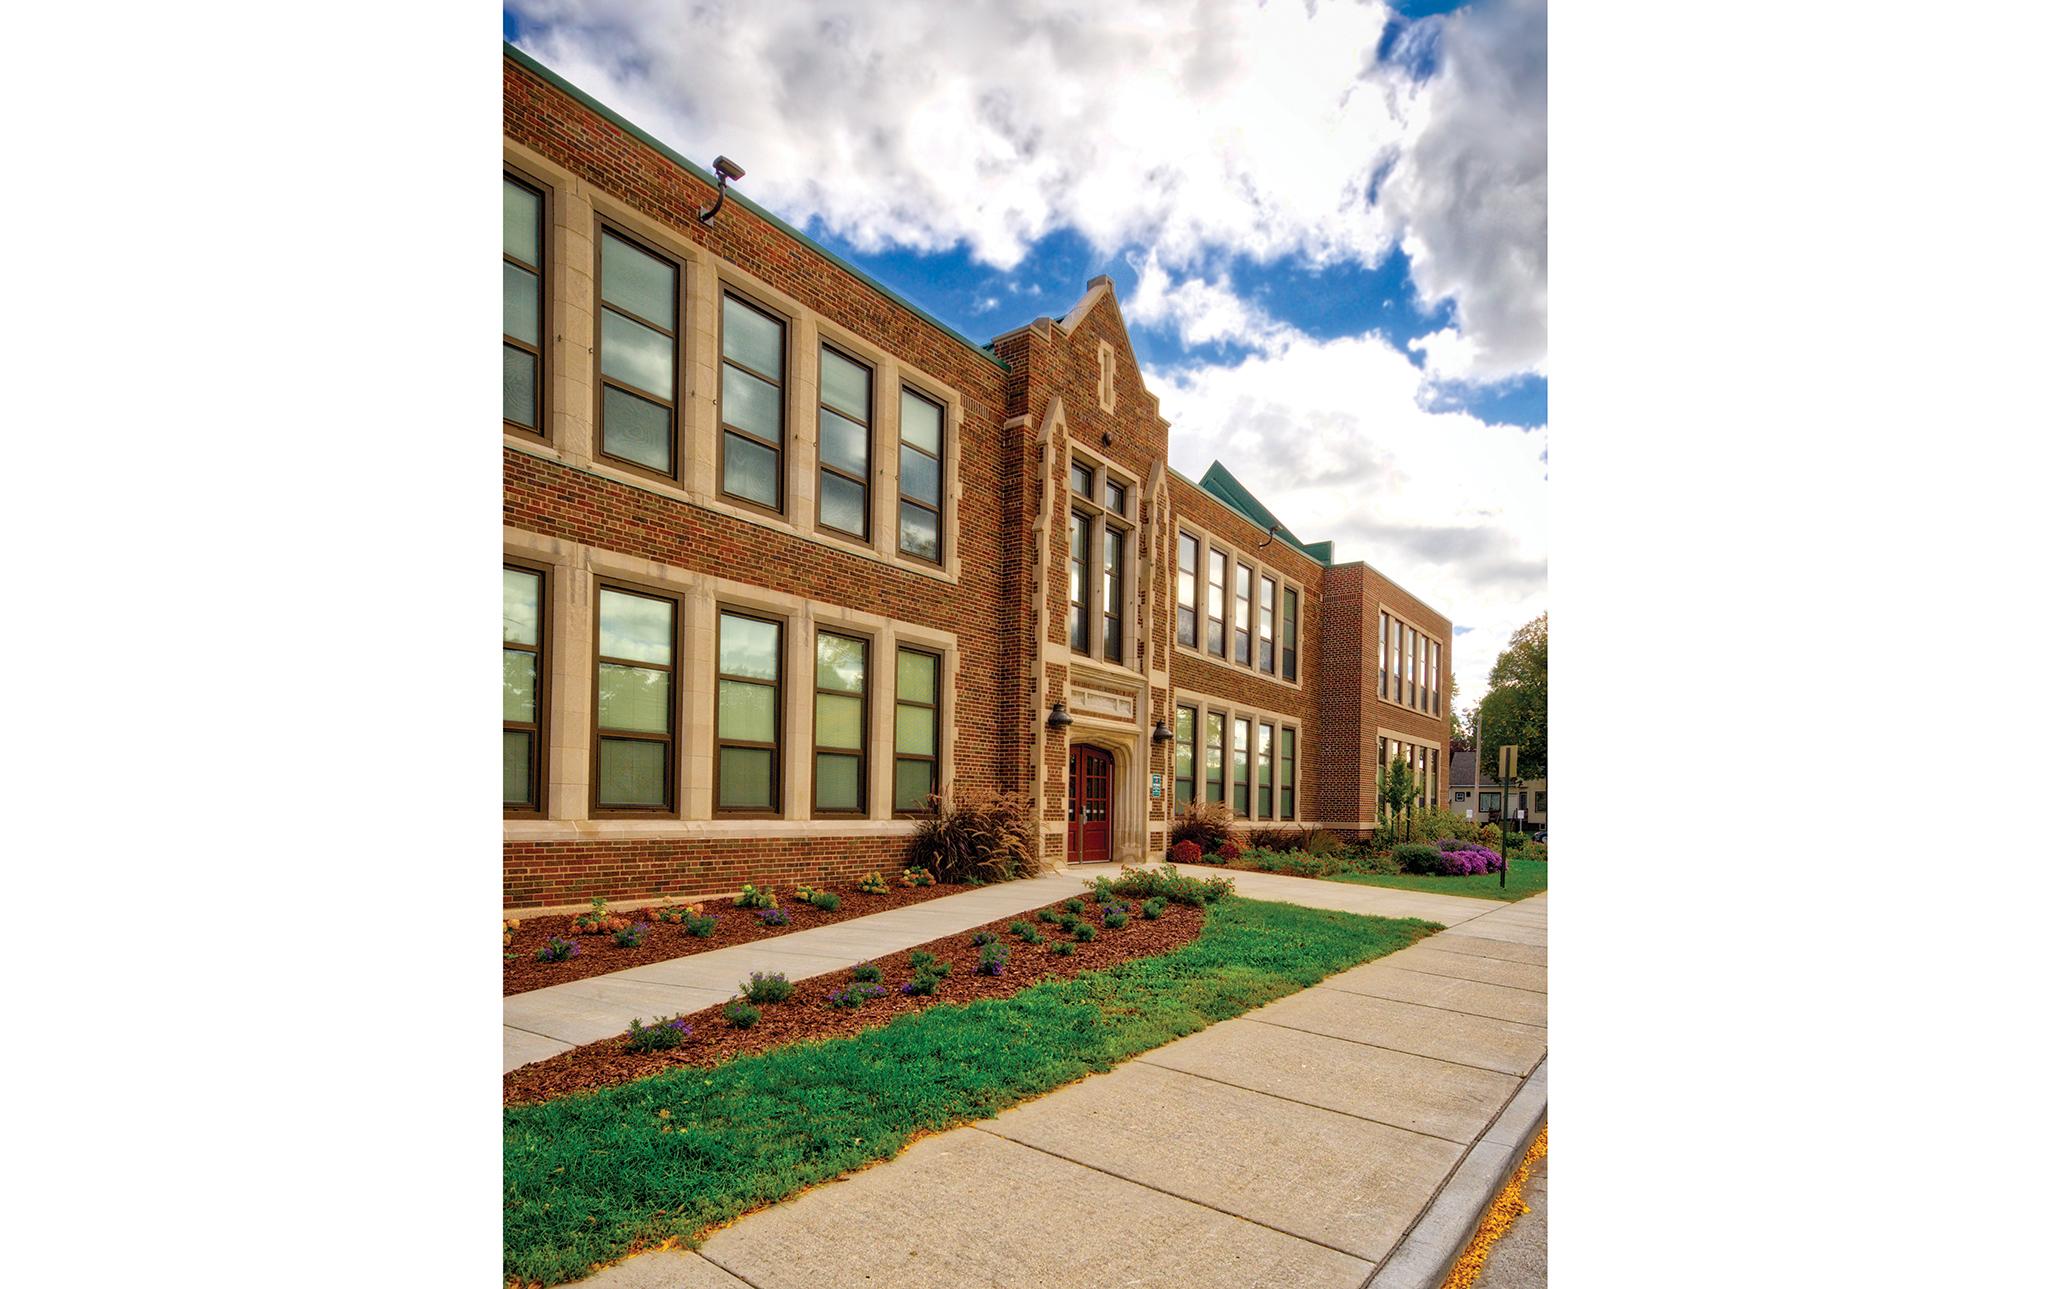 2_Leonardo-DaVinci-School-for-Gifted-Learners